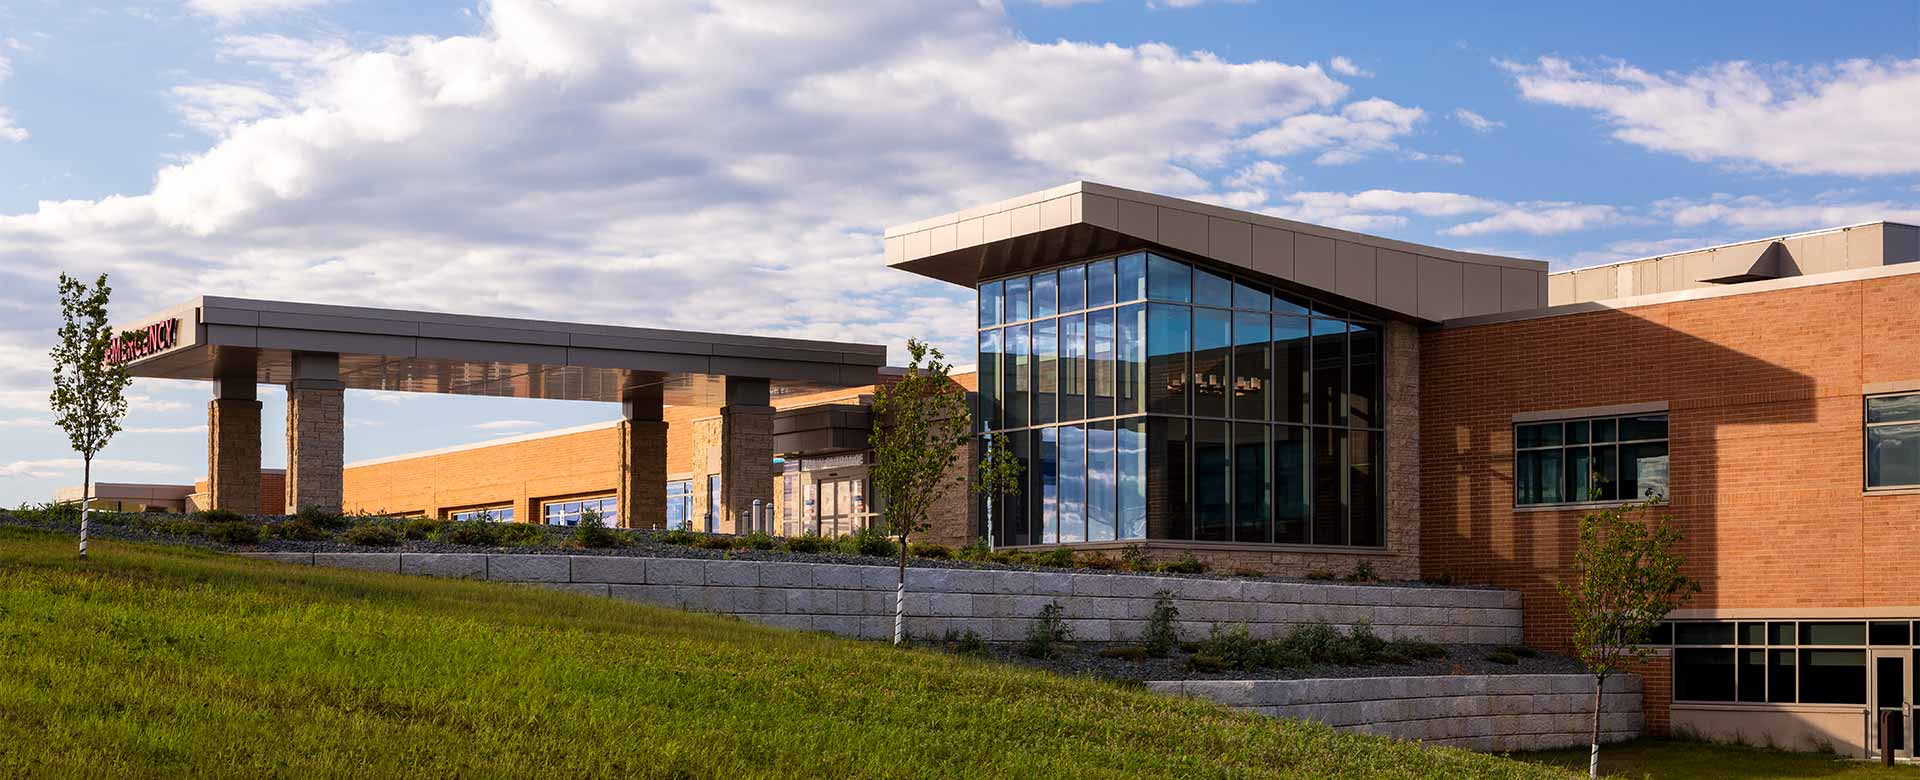 Jackson County Regional Health Center